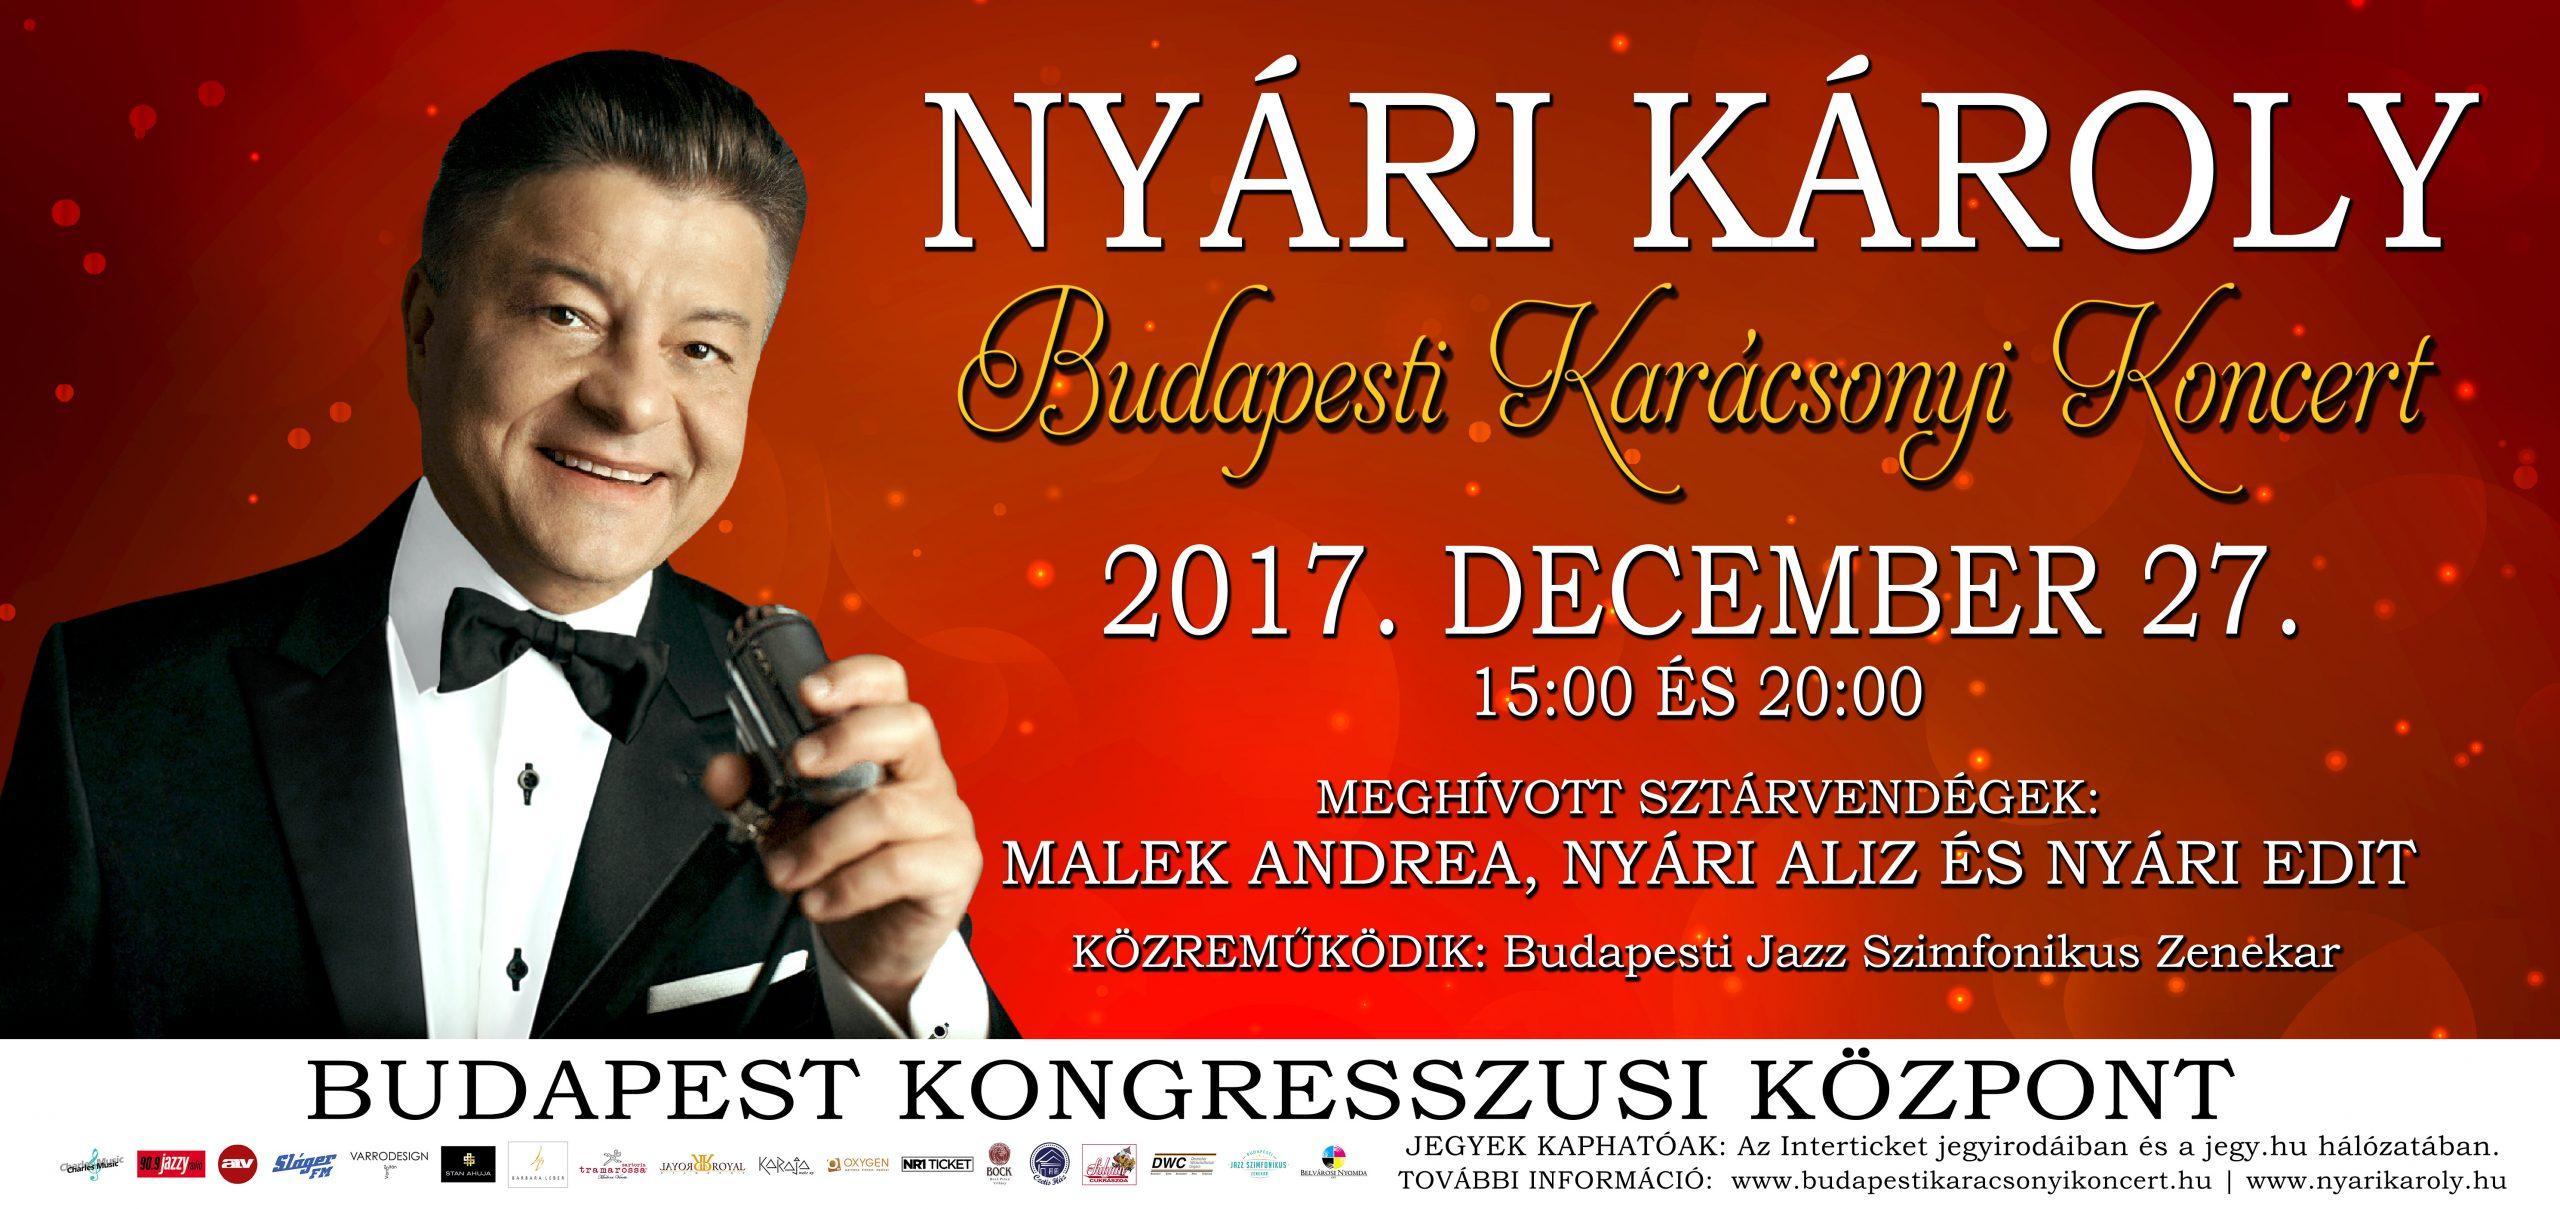 BUDAPESTI KARÁCSONYI KONCERT 2017.